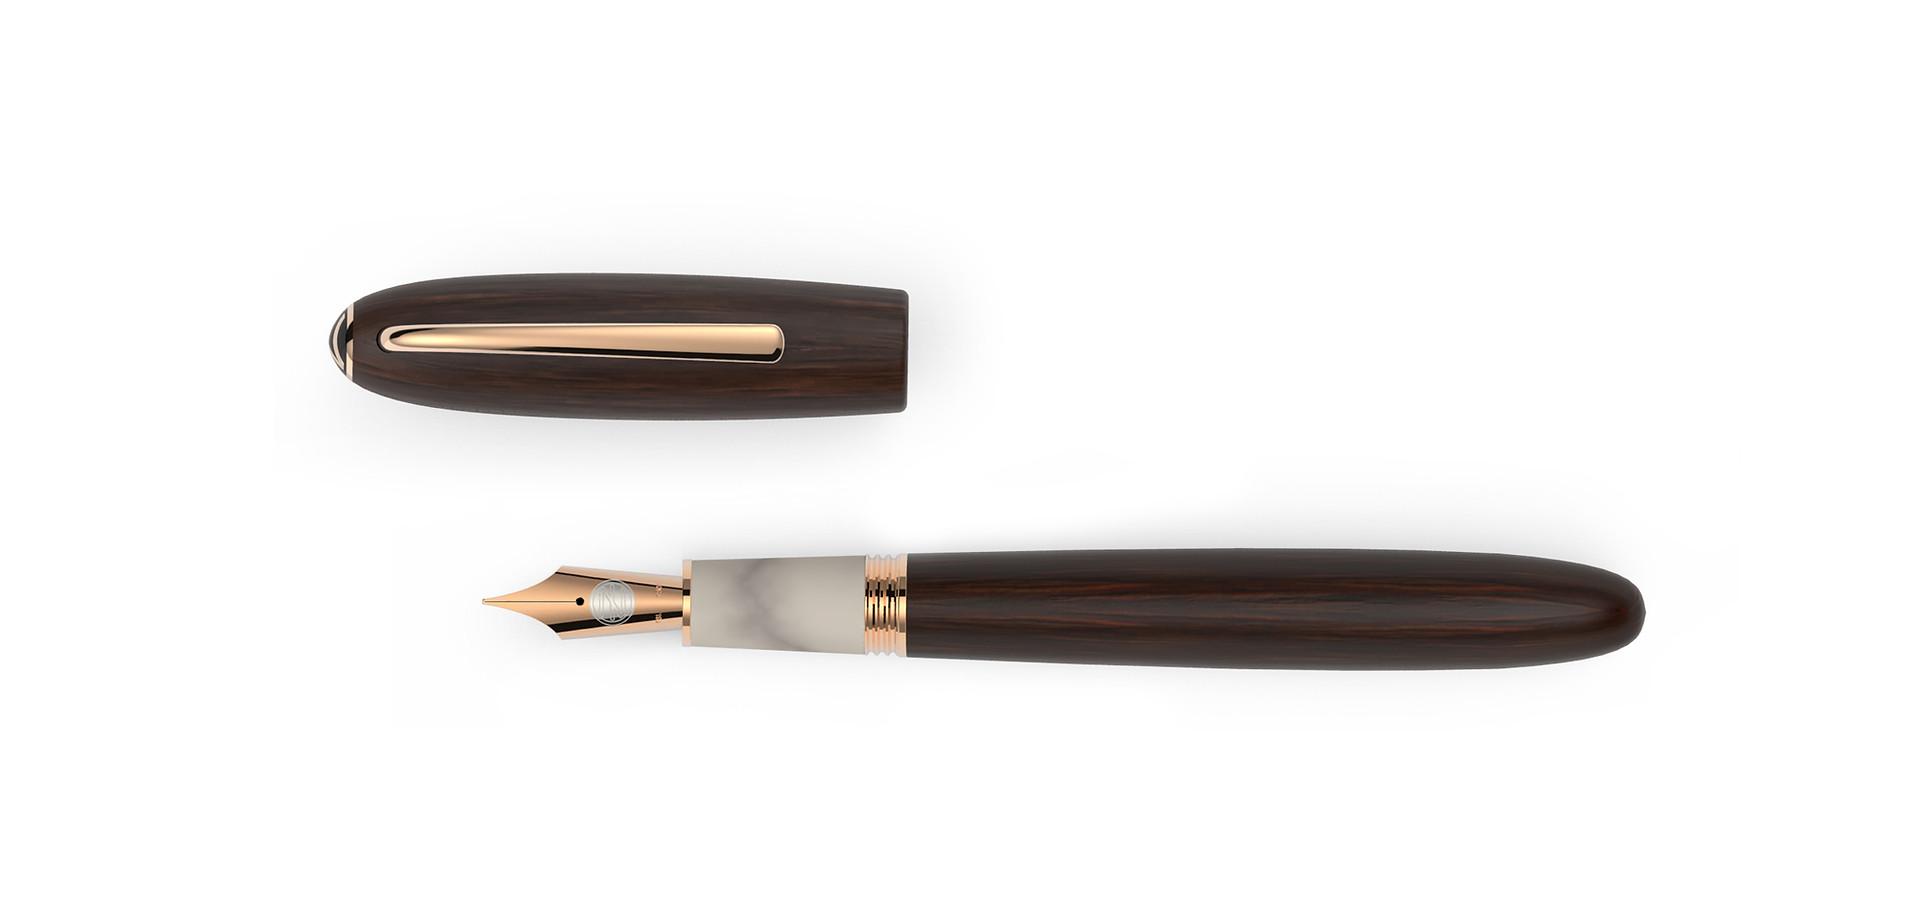 solid gold nib rosegold plated fittings satined matt Grenedilla wood horn  1.475,- €